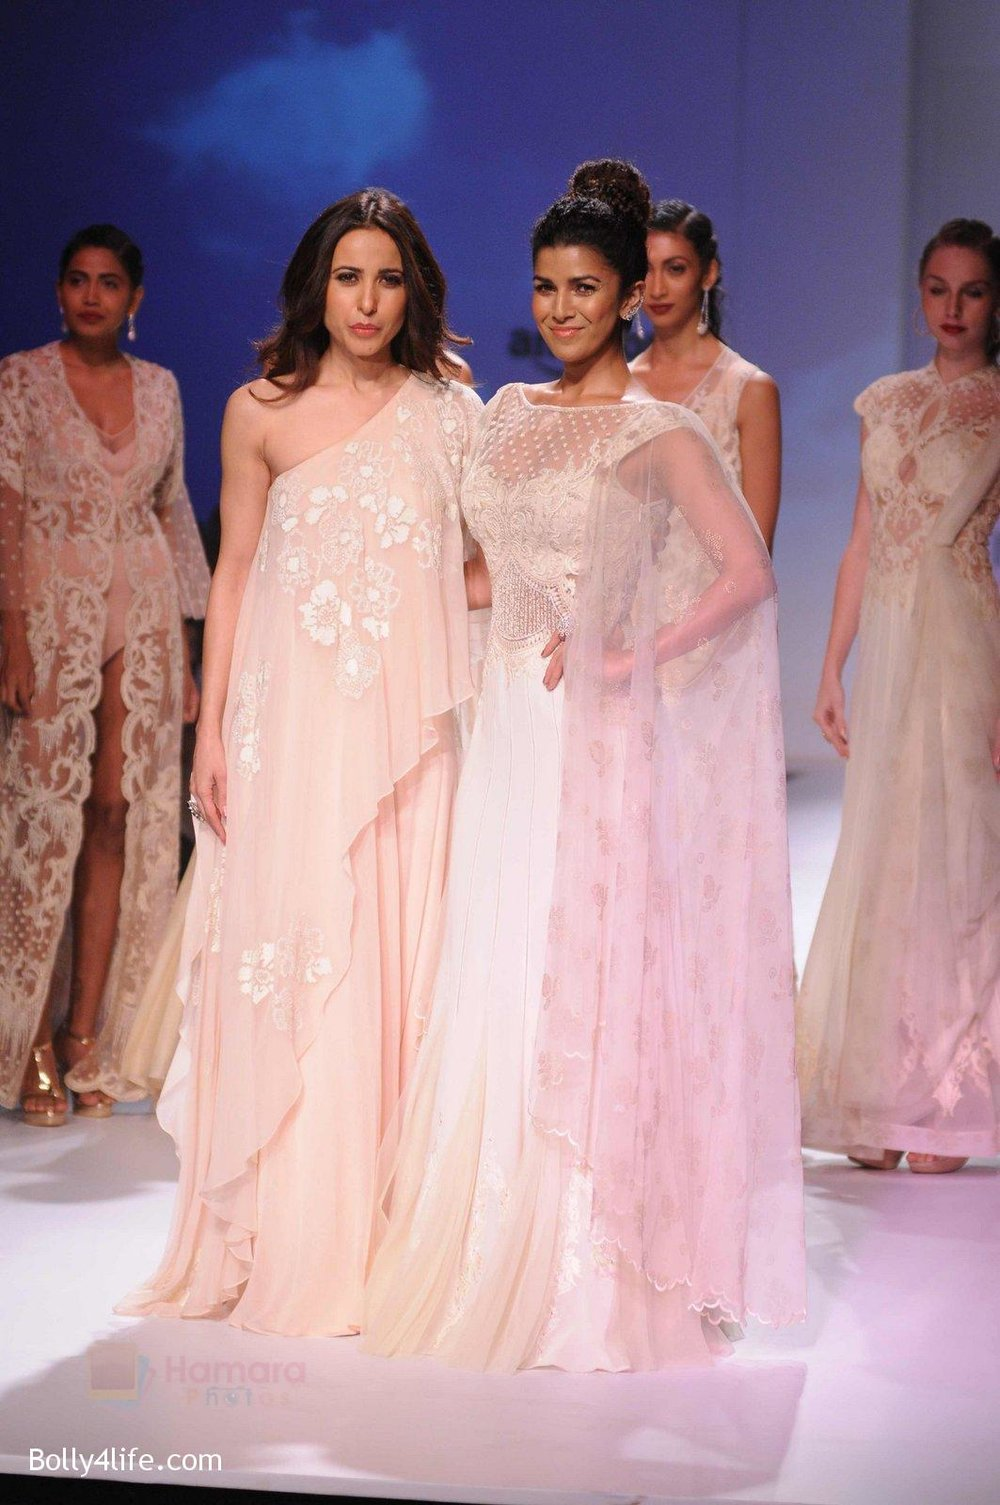 Nimrat-Kaur-walk-the-ramp-for-Mandira-Wrik_s-show-at-Amazon-India-Fashion-Week-on-15th-Oct-2016-5.jpg